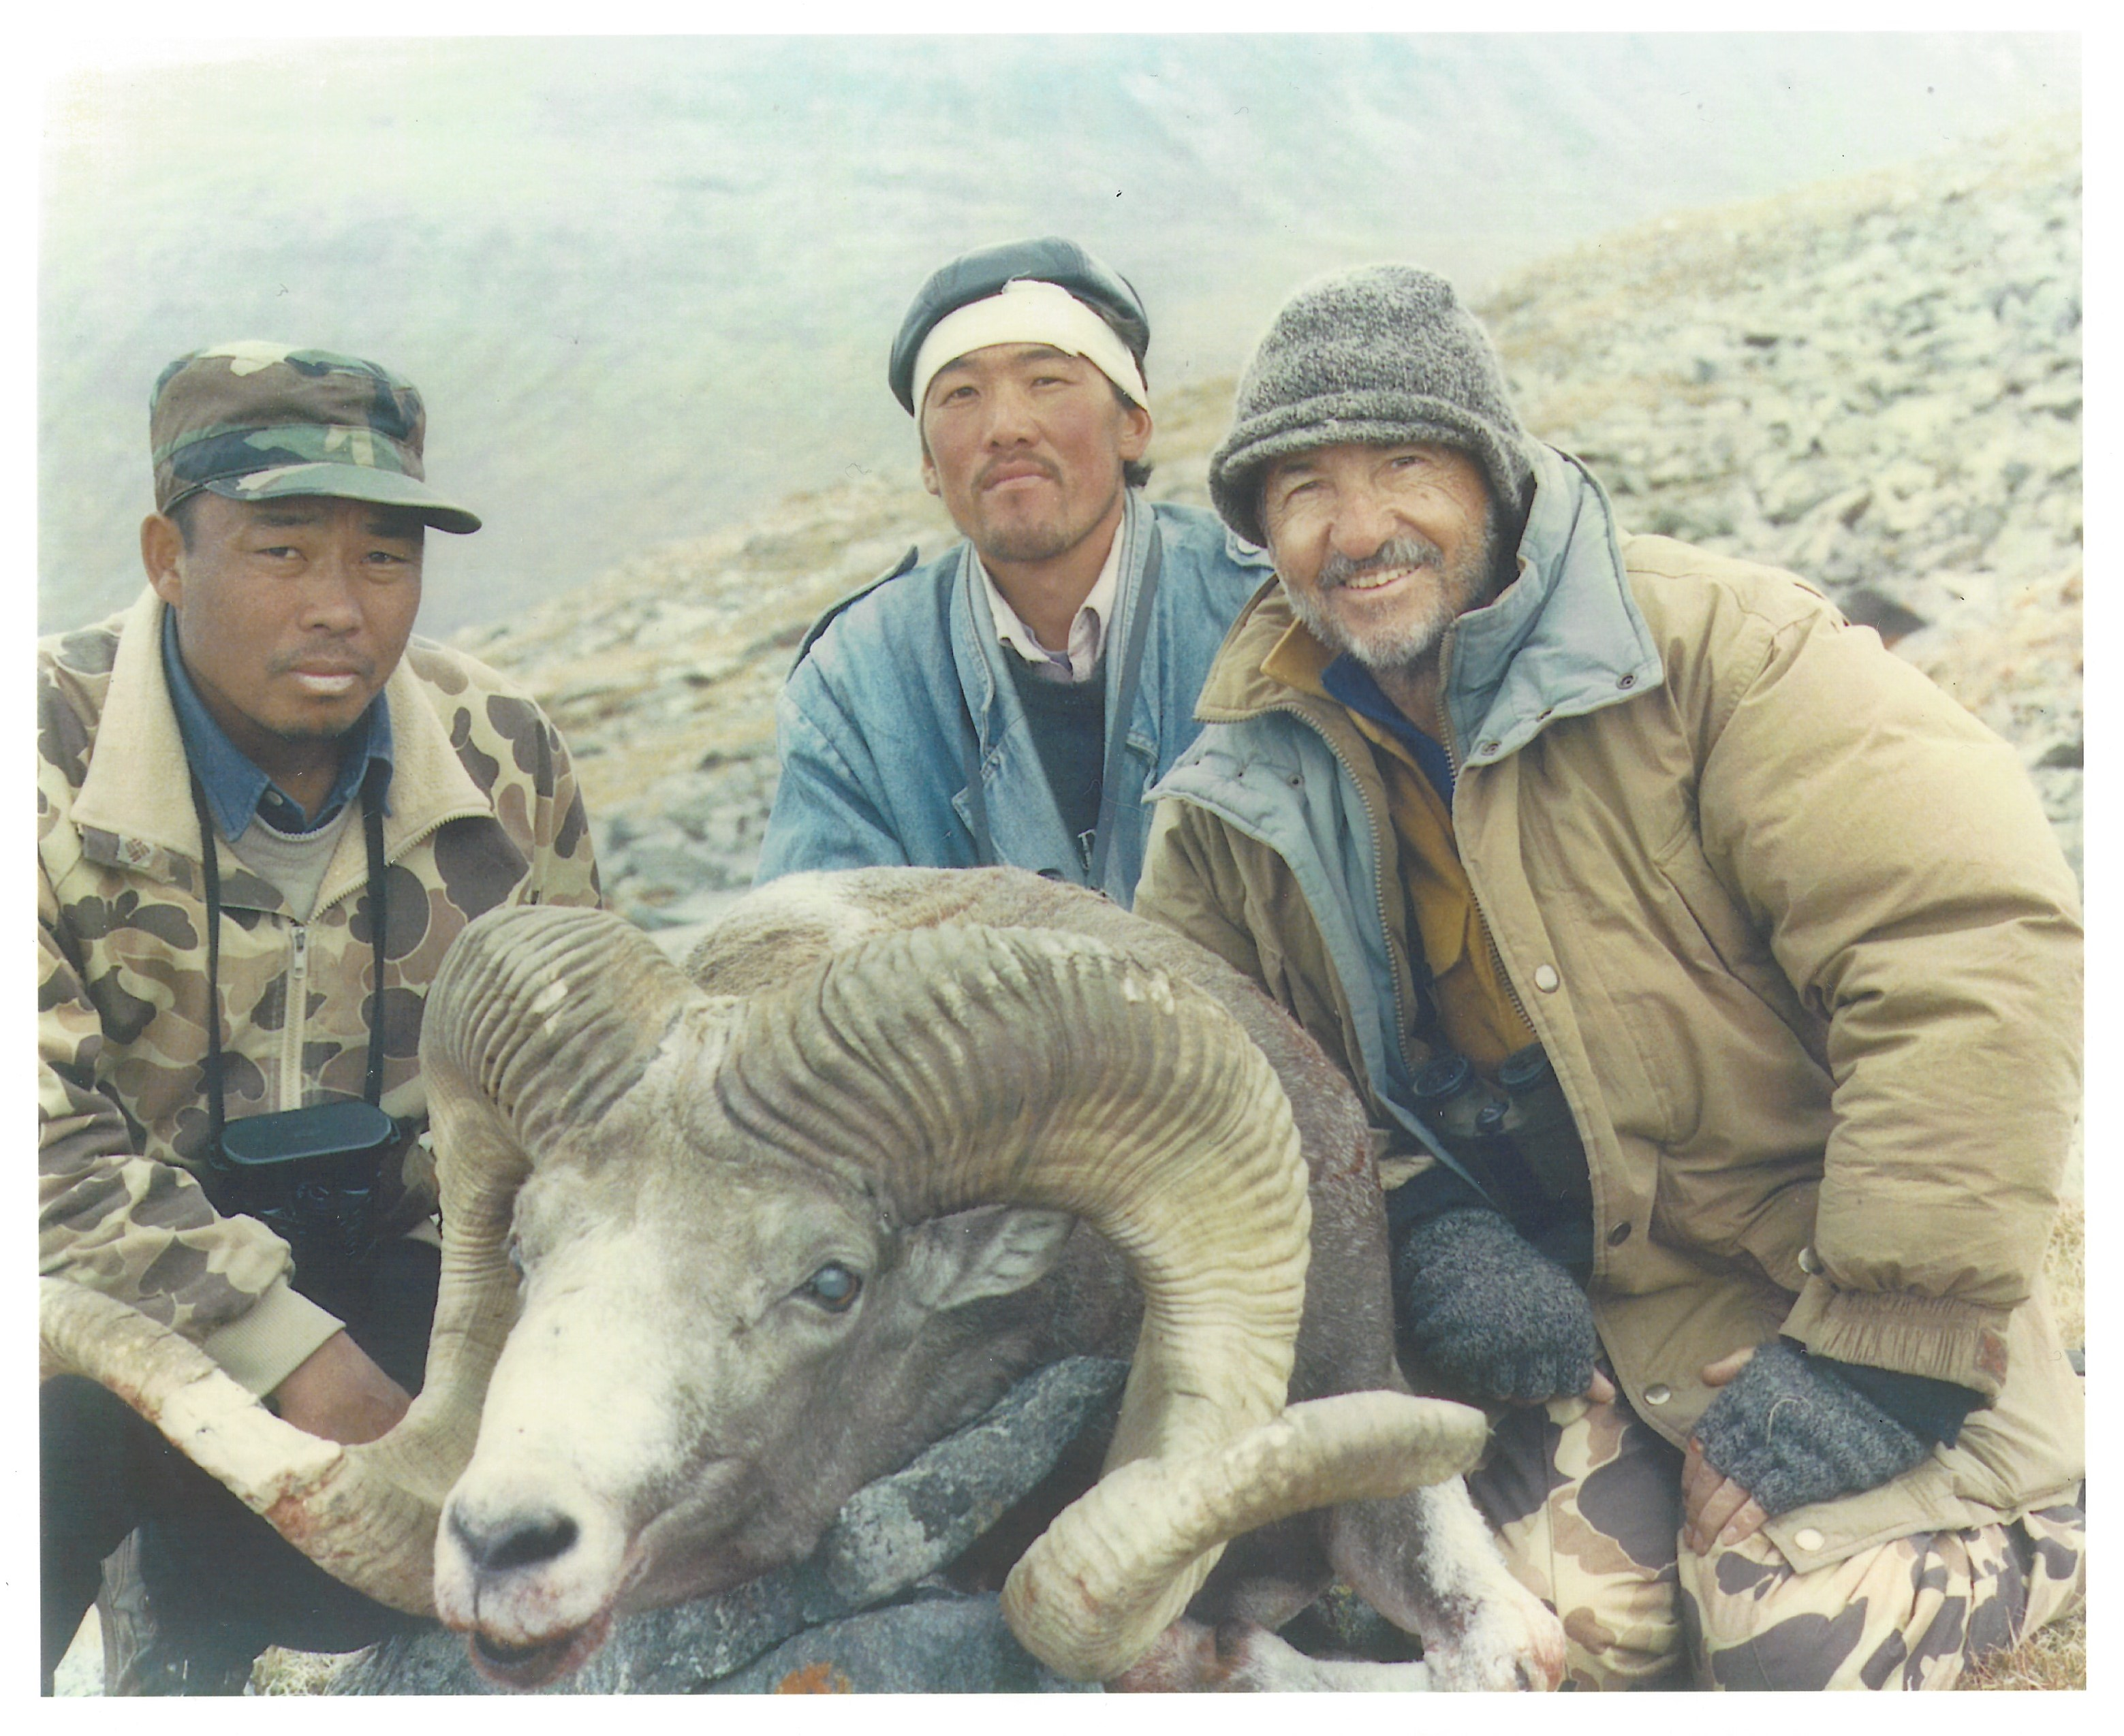 David Terk, Mongolia, 1998